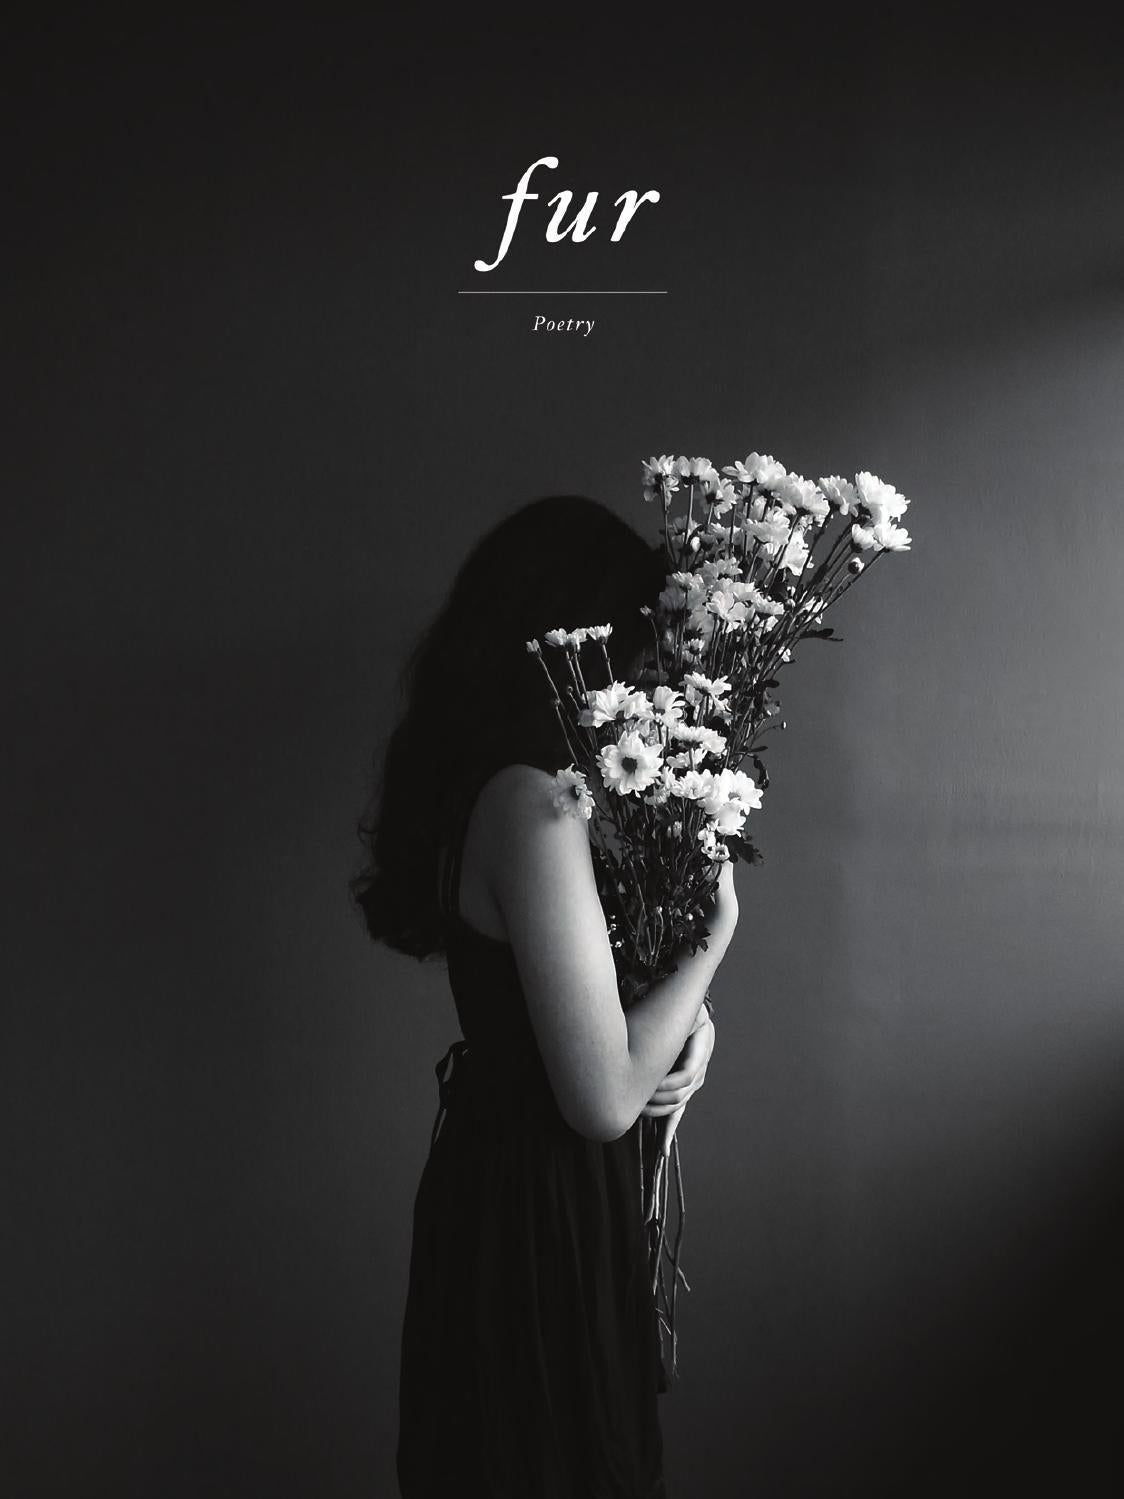 poetry by fur magazine issuu